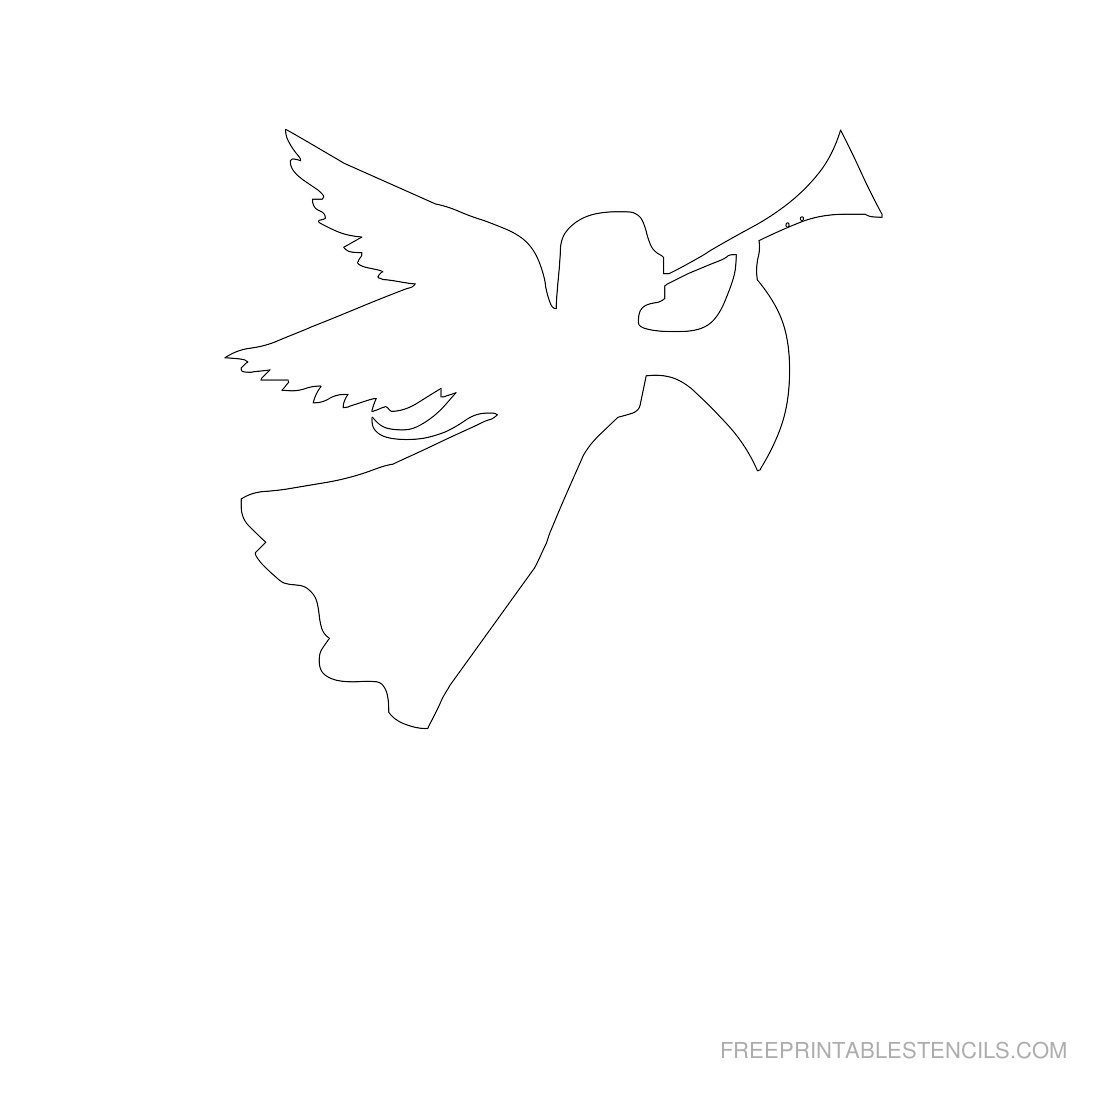 Free Printable Angel Stencils   Free Printable Stencils - Free Printable Pictures Of Angels